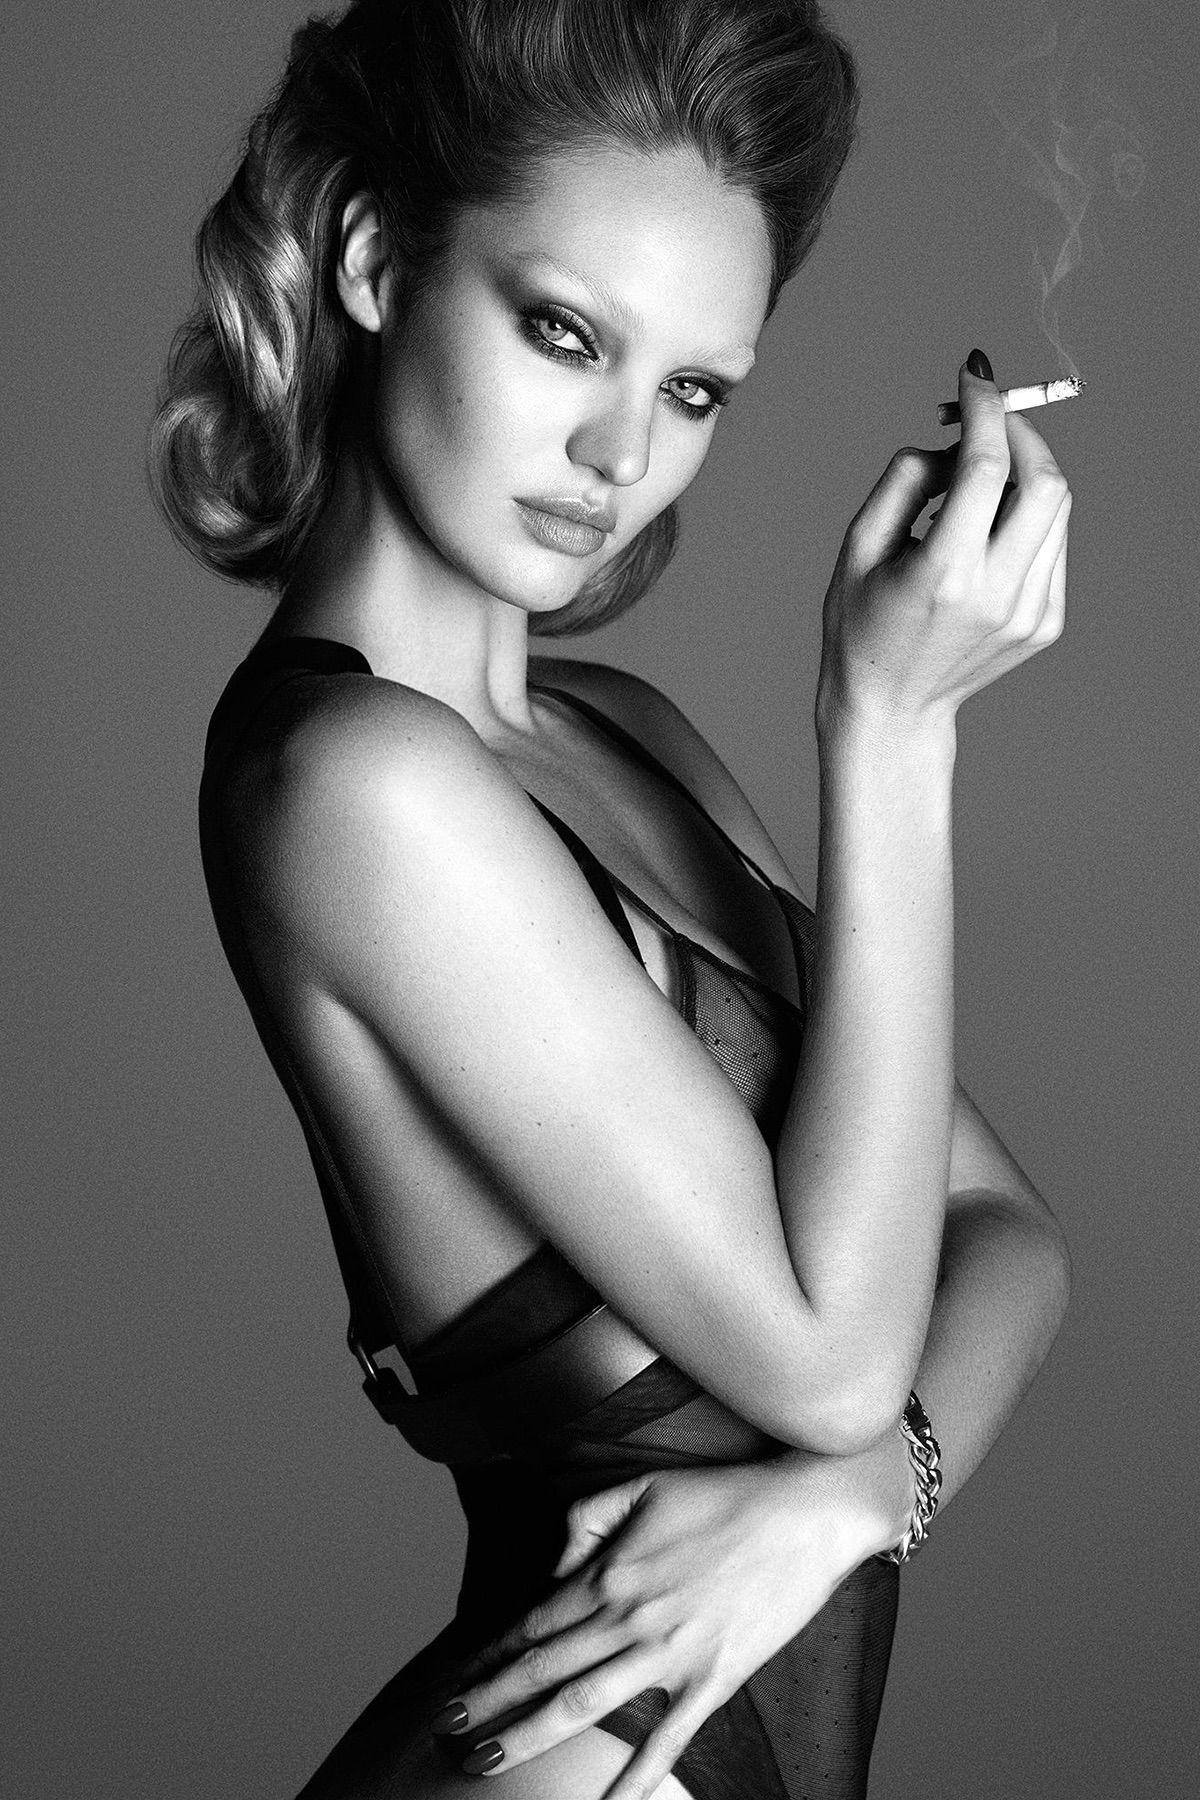 Ivy Levan Nude Best pinjennifer on bw fashion photography   pinterest   fashion